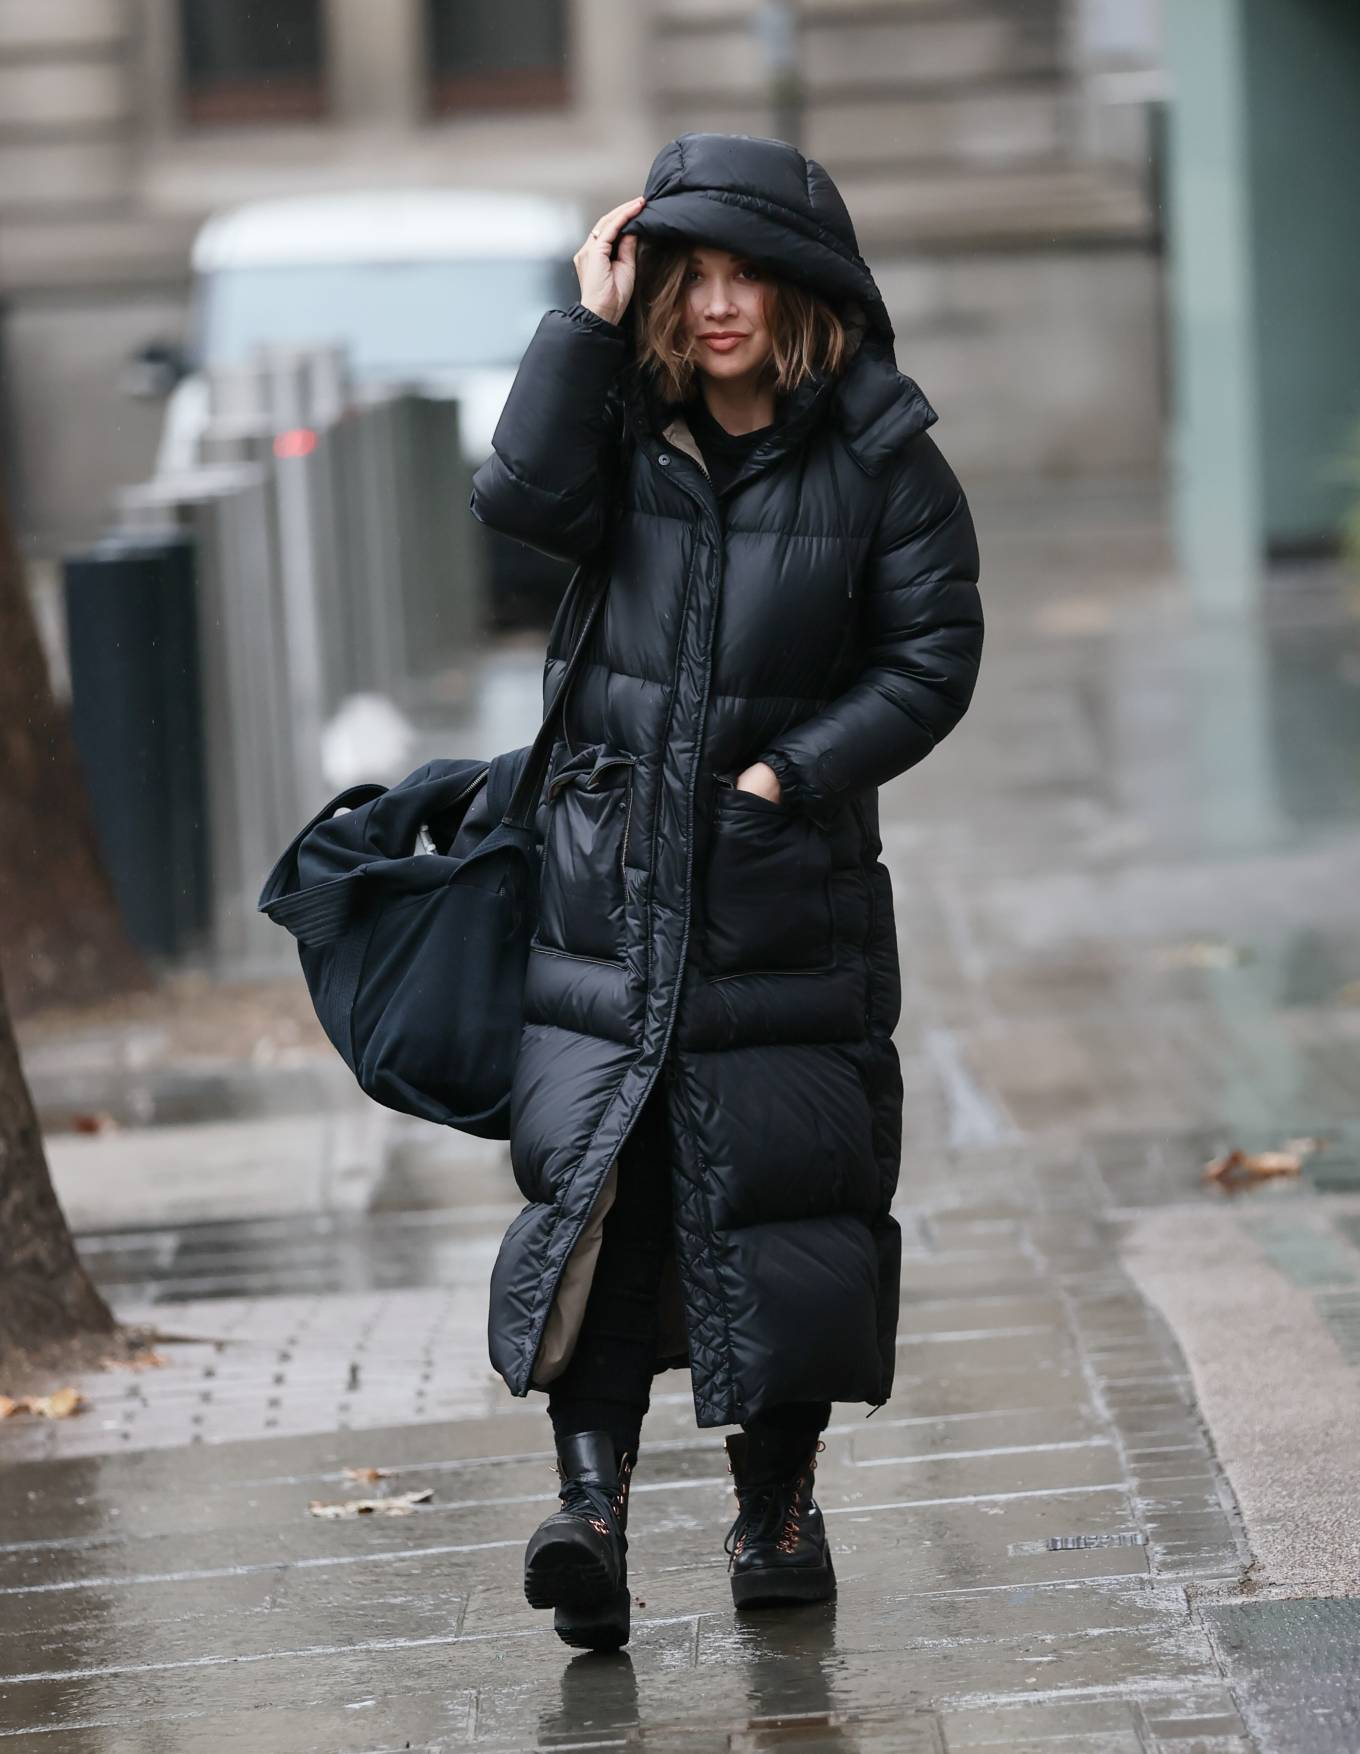 Myleene Klass 2020 : Myleene Klass – In a warm coat arriving at Smooth radio in London-04